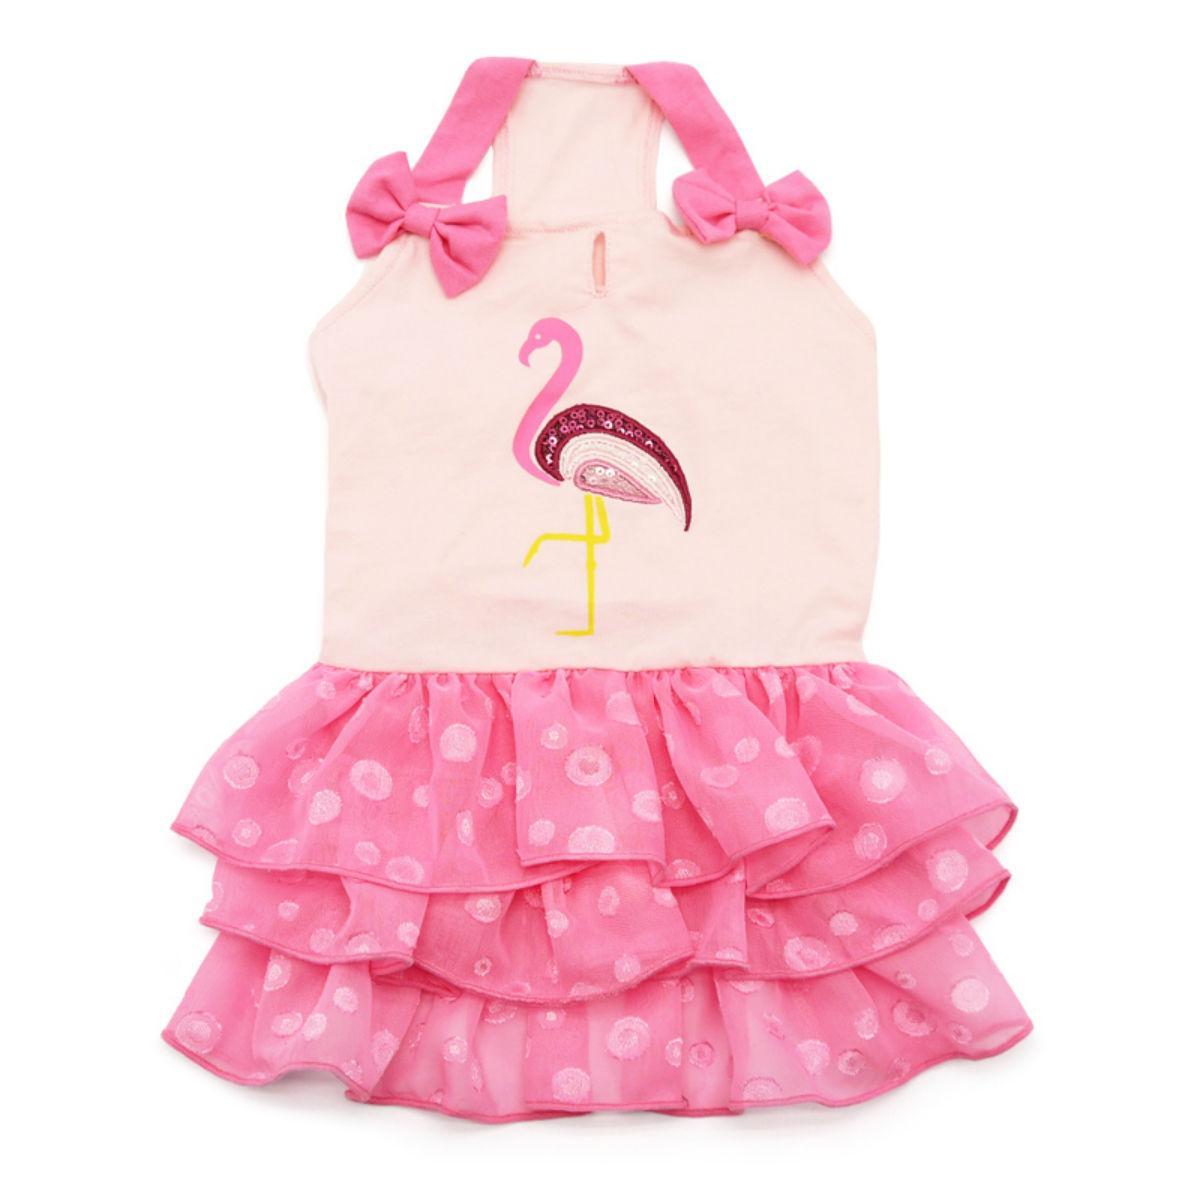 Sequin Flamingo Dog Dress by Dogo